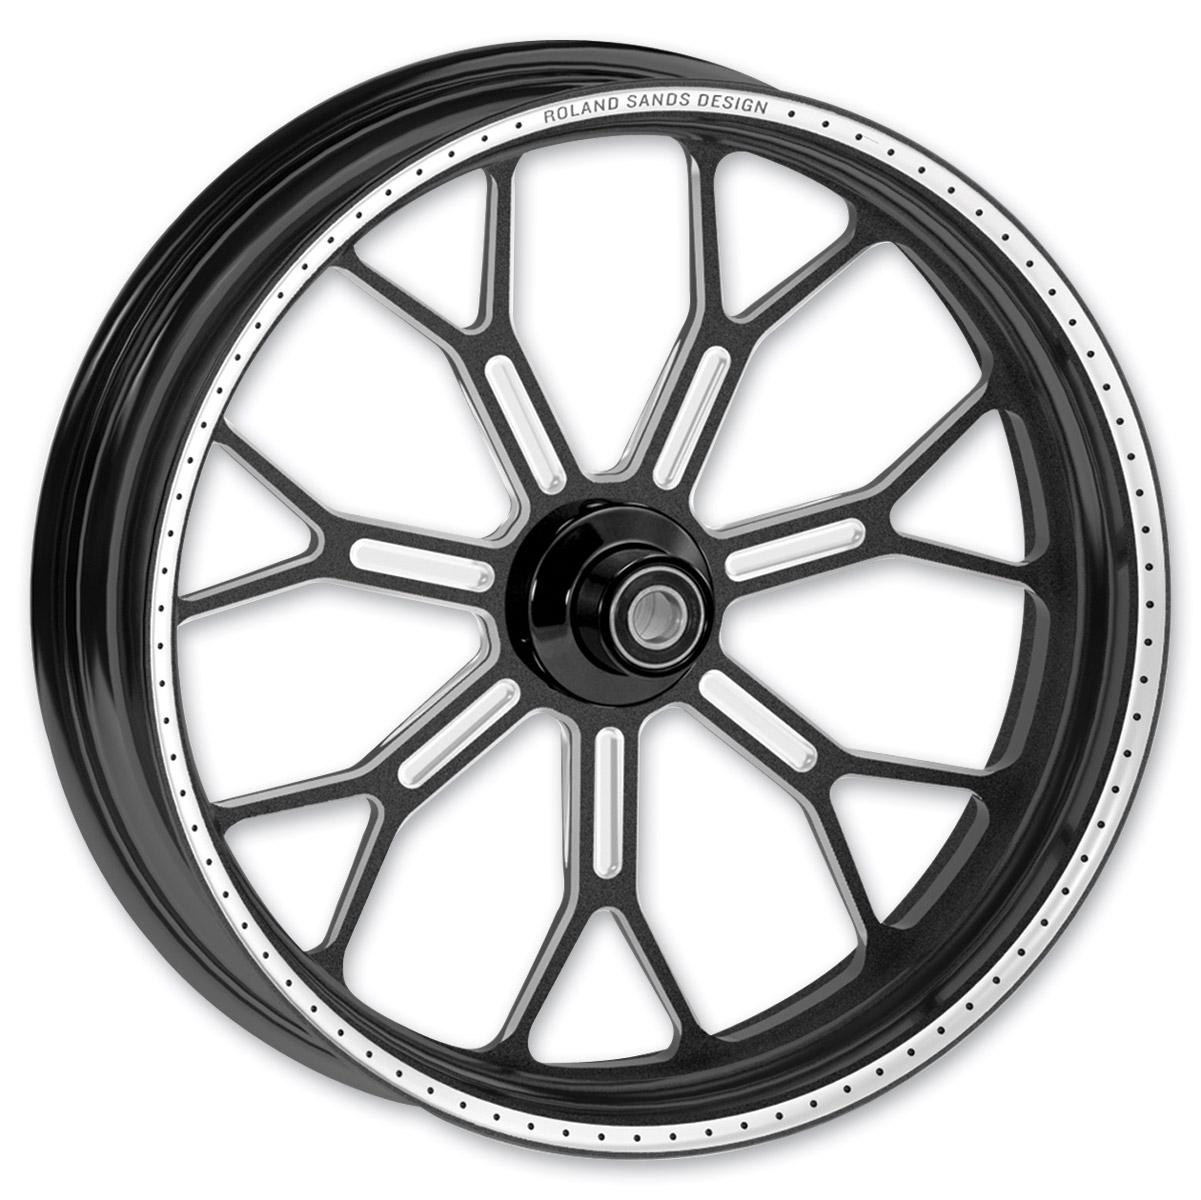 Roland Sands Design Del Mar Contrast Ops Rear Wheel, 17